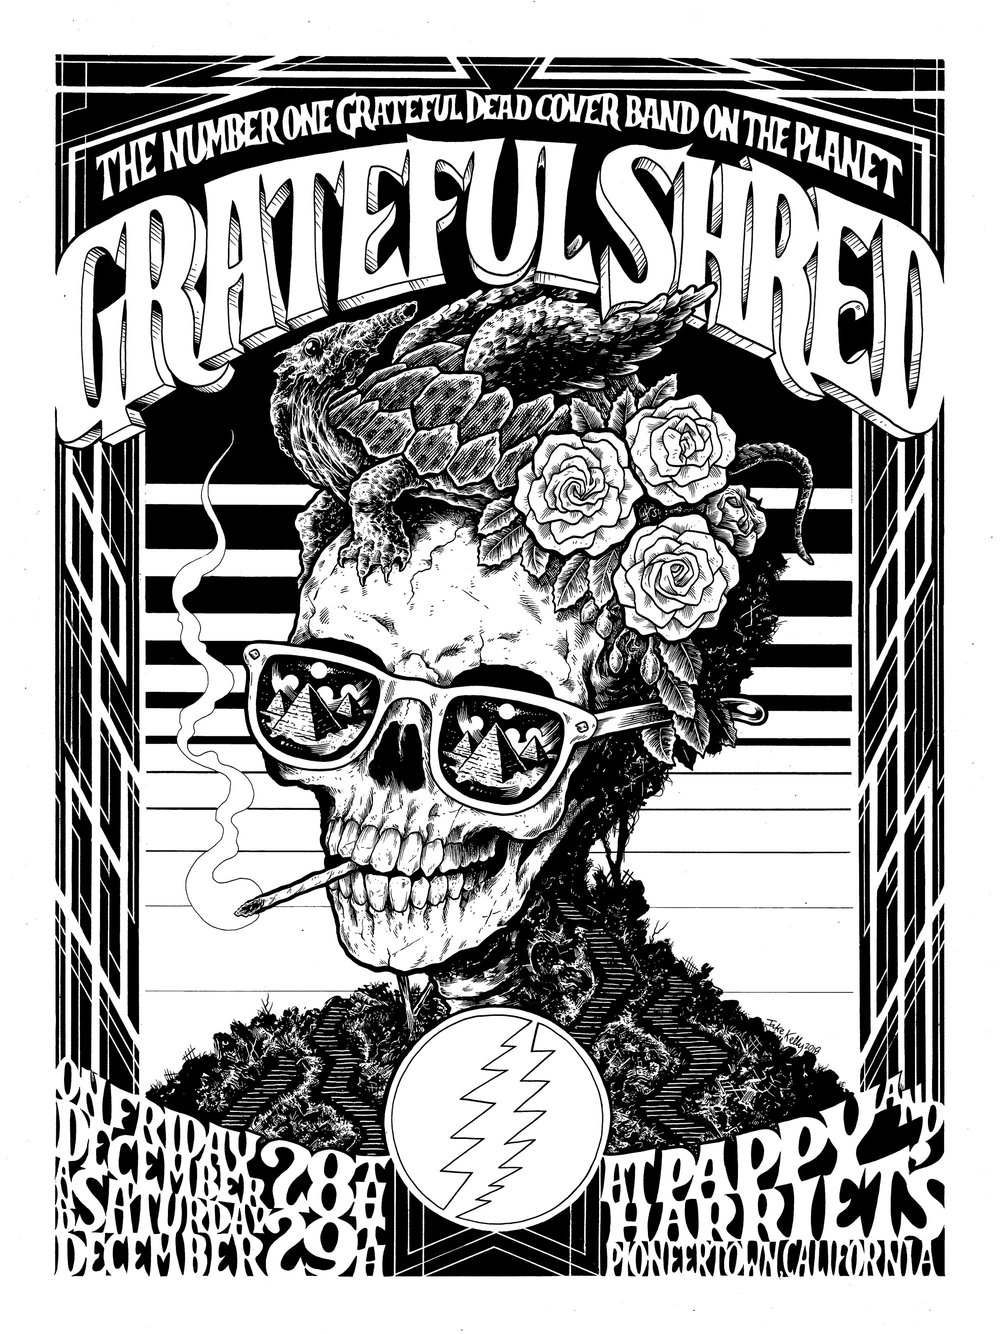 Grateful Shred Pappys 12.28.18. Web.jpg